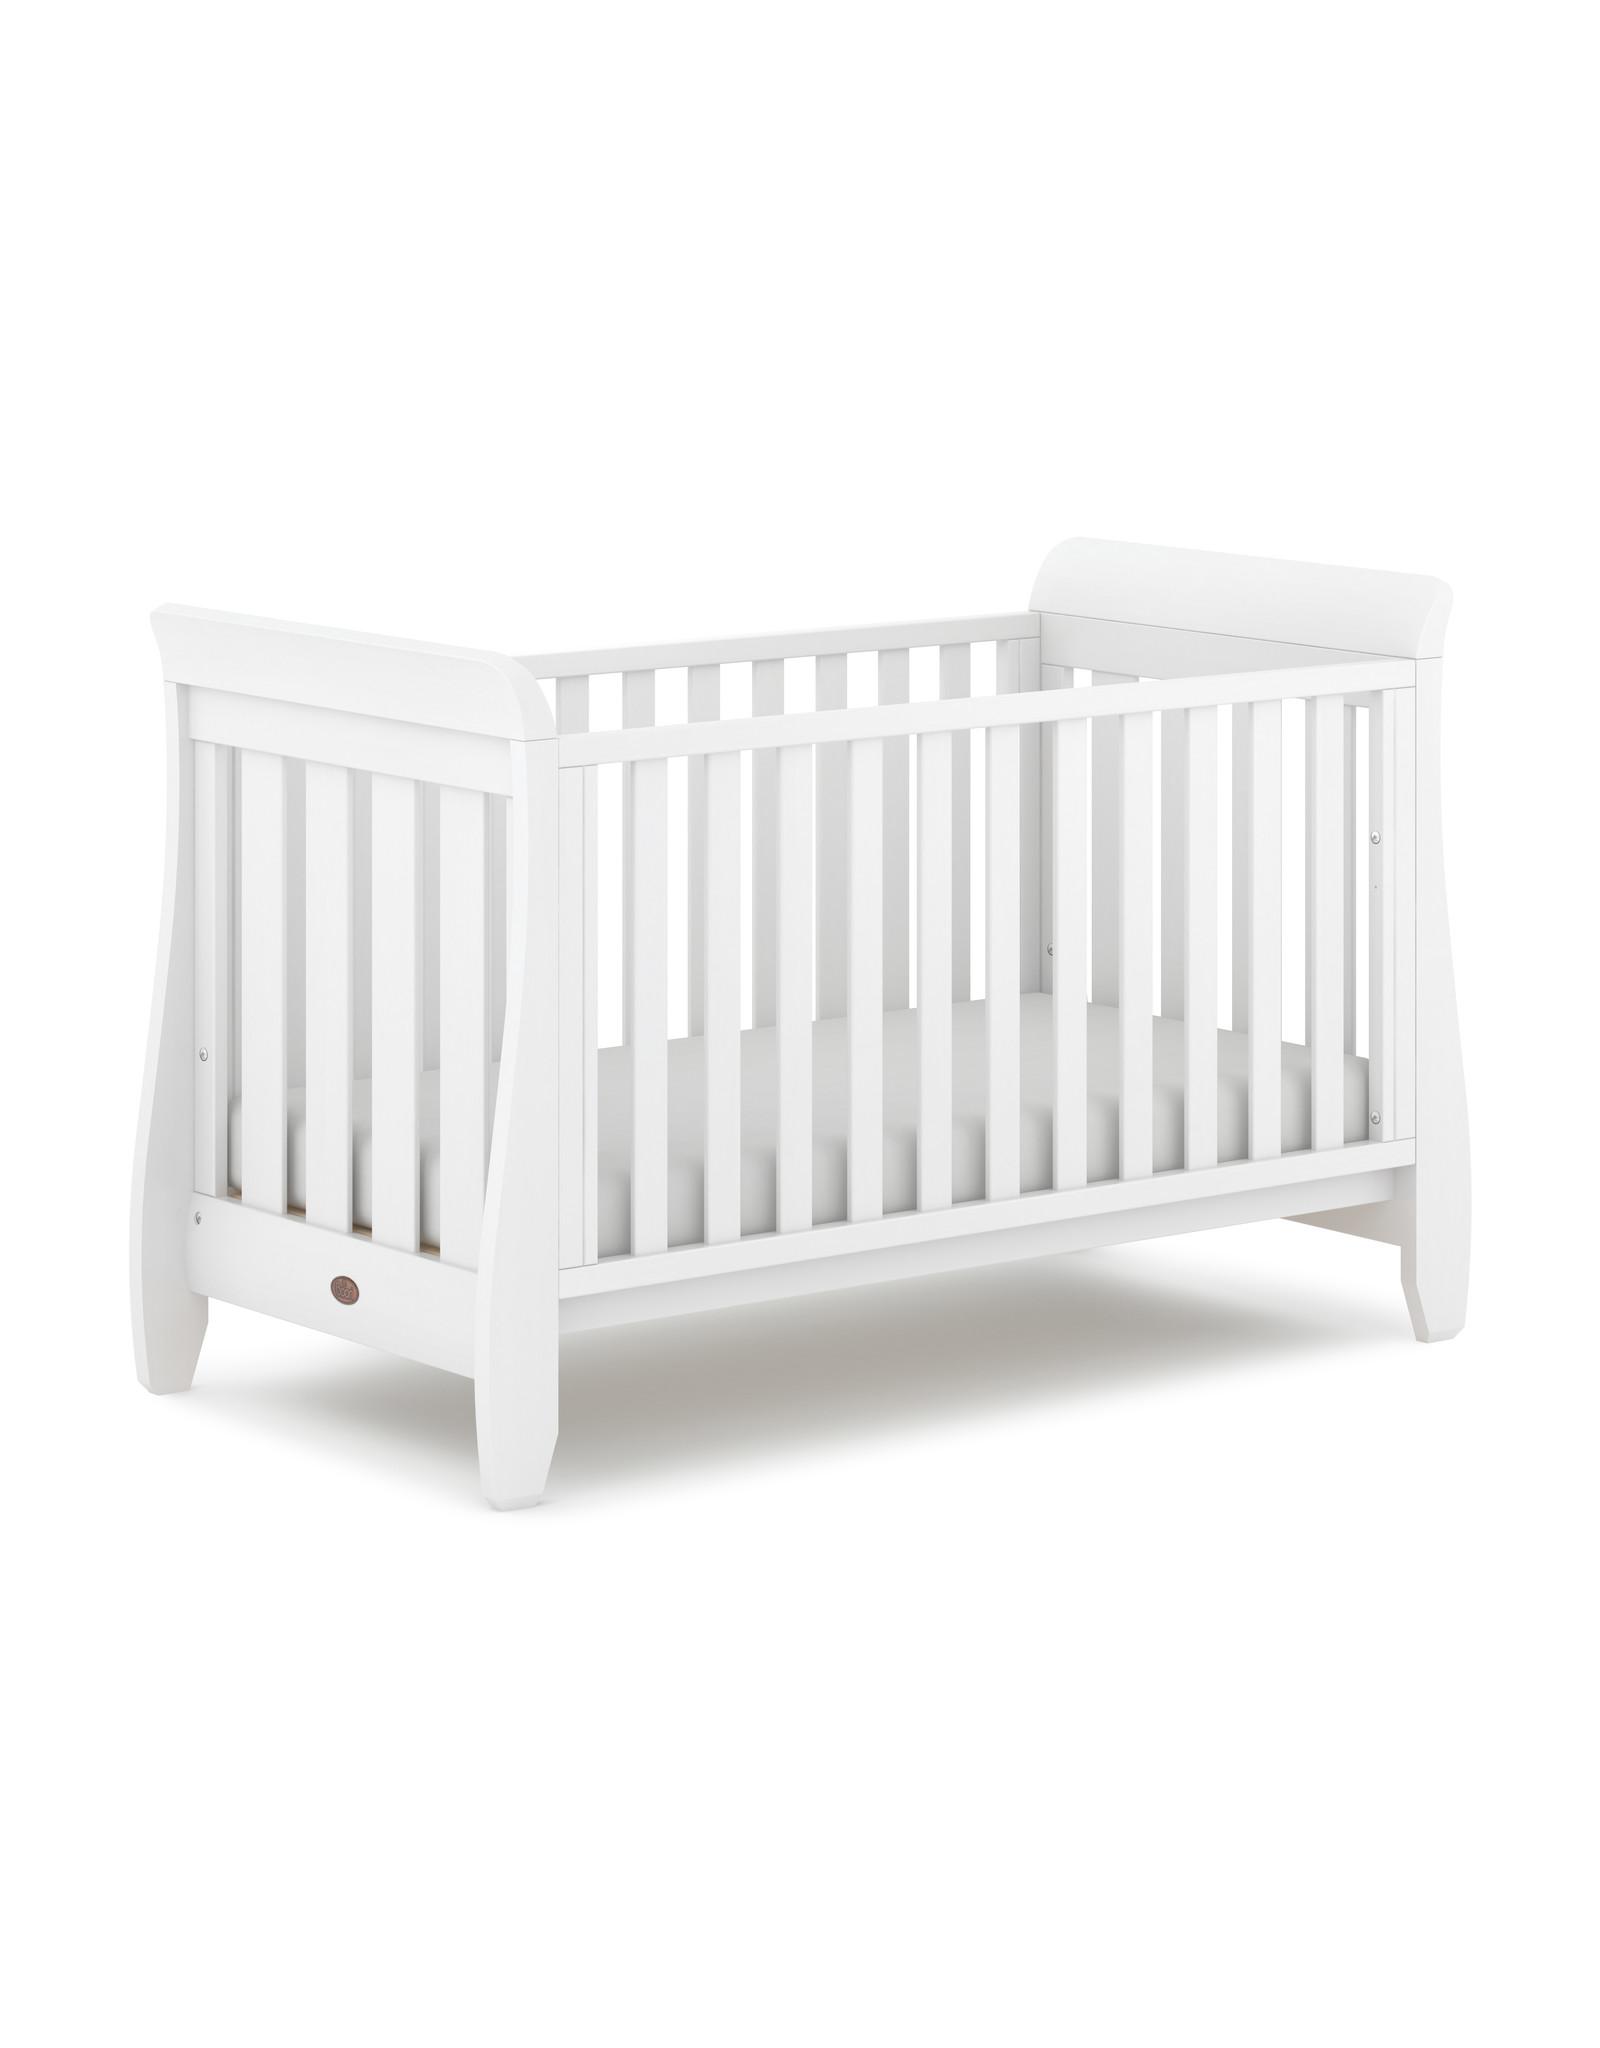 Boori Sleigh Urbane Cot Bed- White